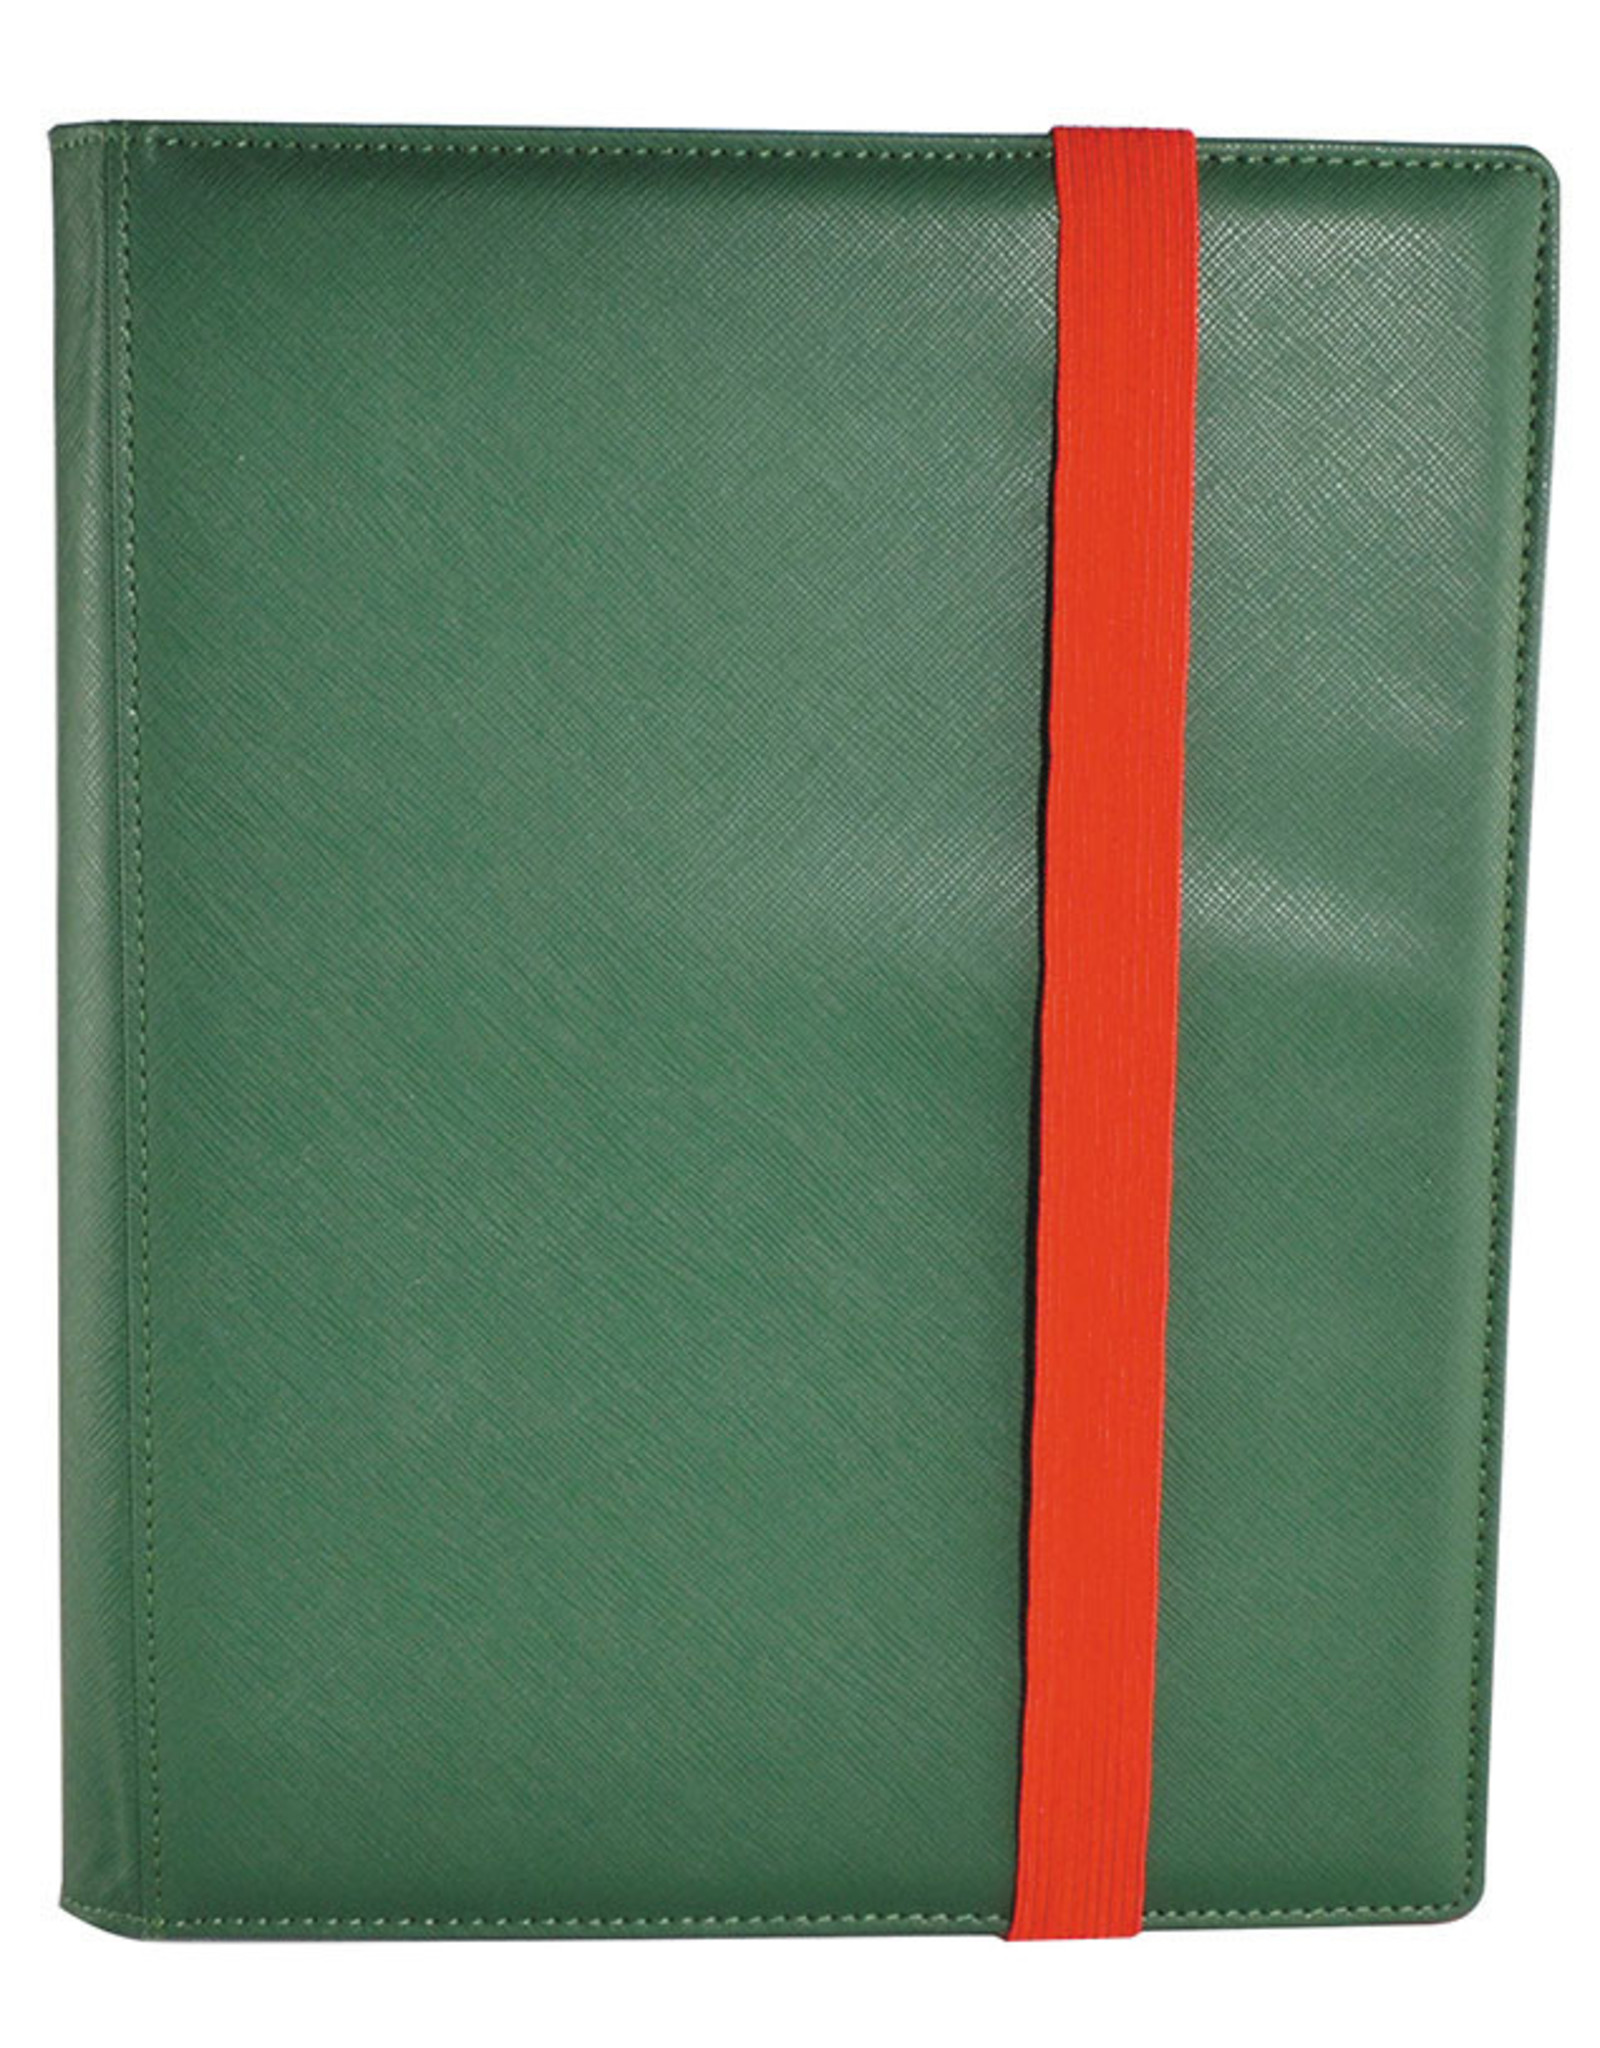 Dex Protection Dex 9-Pocket Binder Green